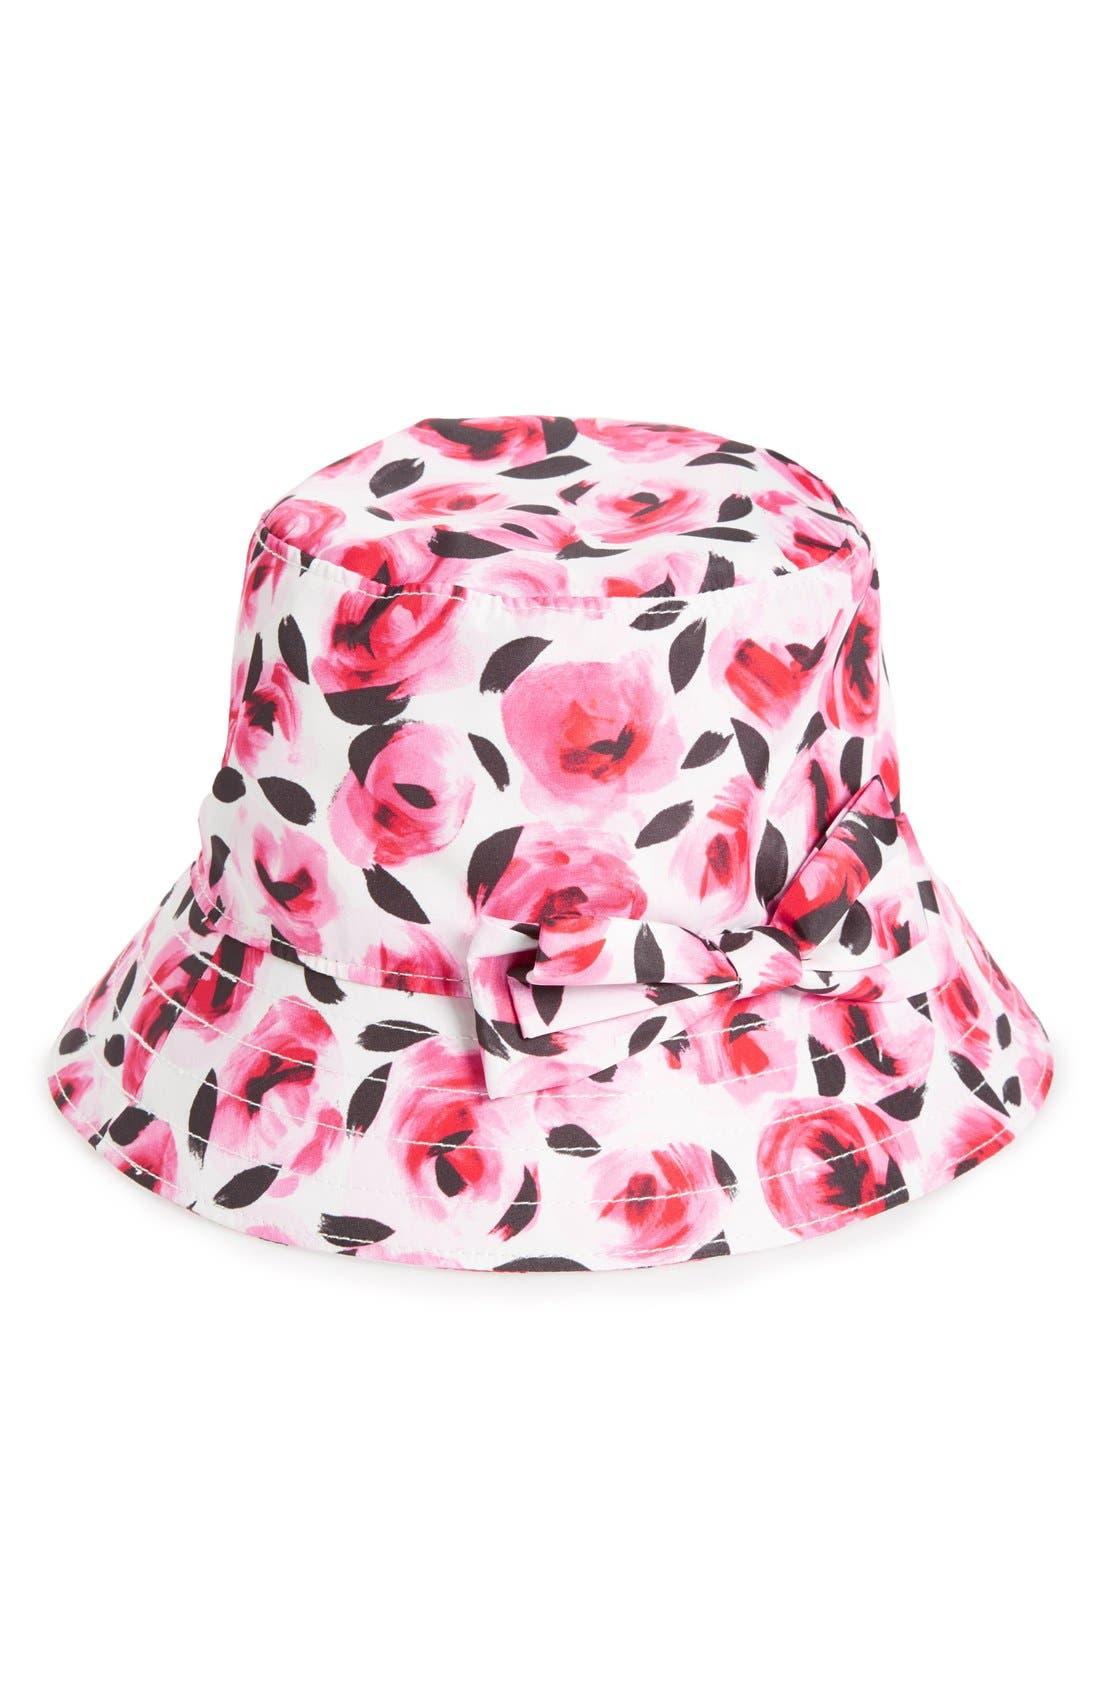 KATE SPADE NEW YORK, rain bucket hat, Main thumbnail 1, color, 650